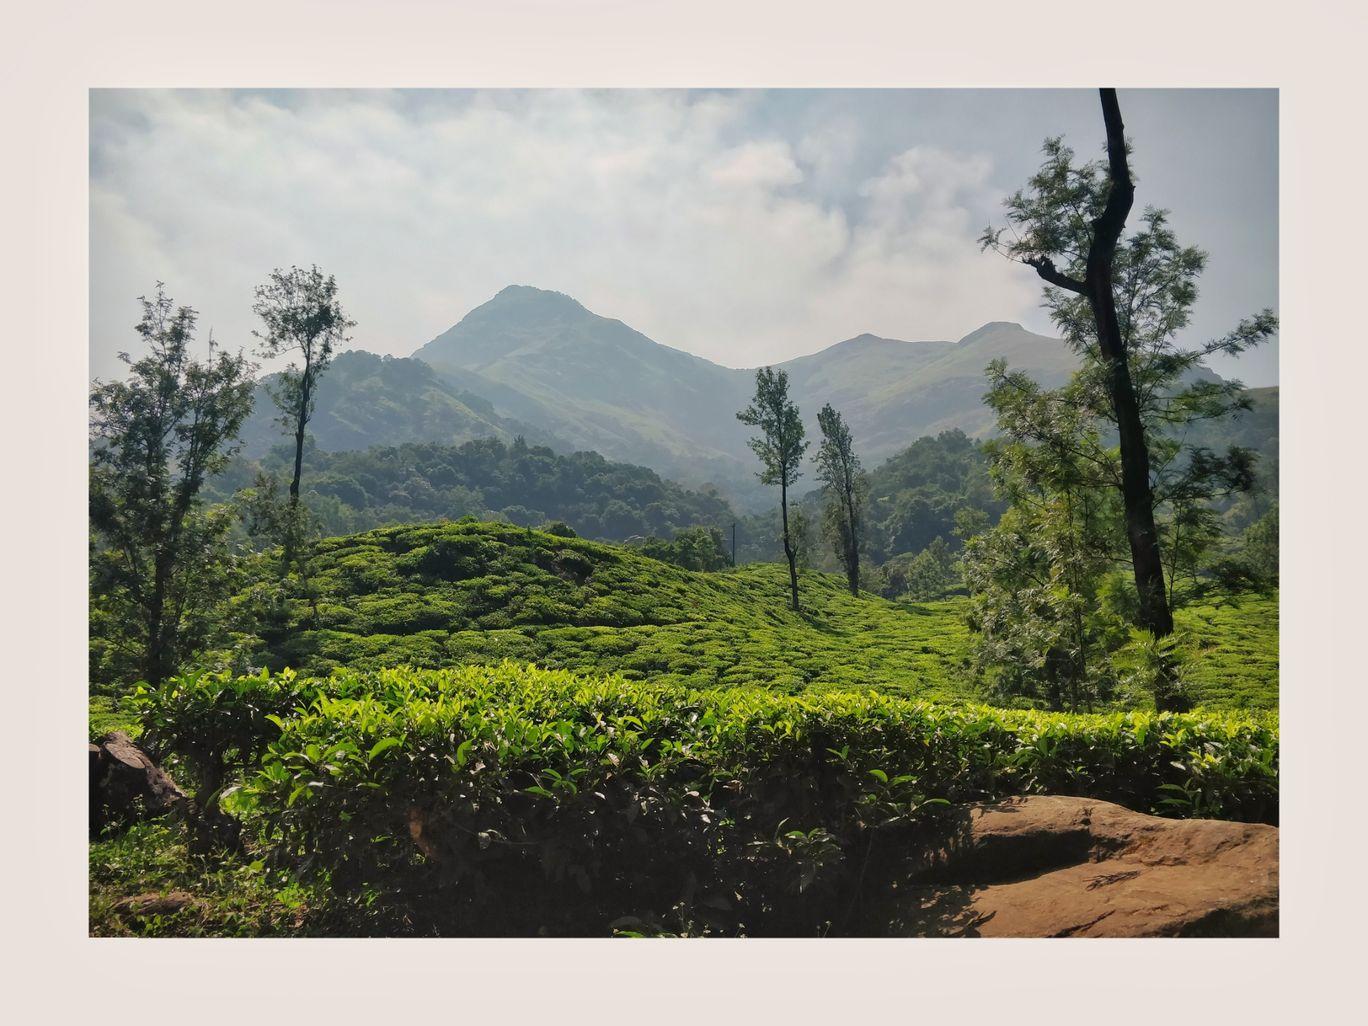 Photo of Wayanad By Niladrit Mondal